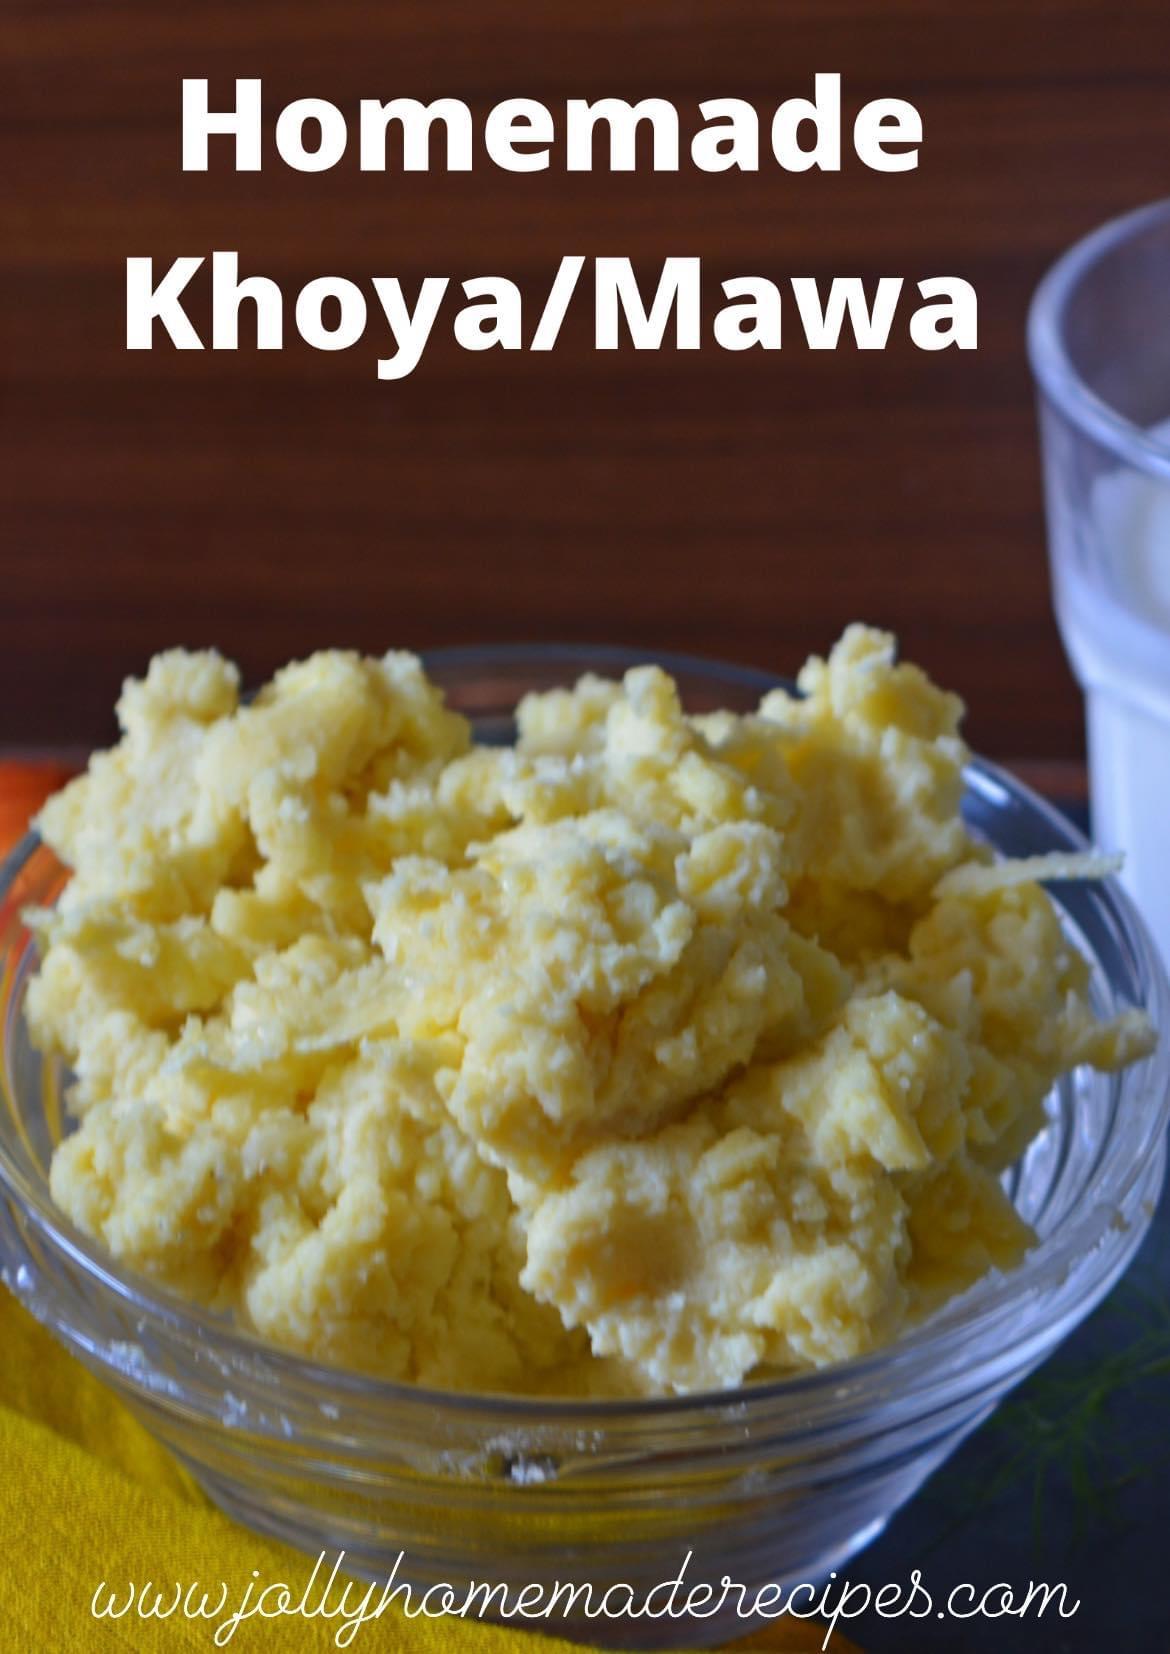 Homemade Khoya(mawa) Recipe